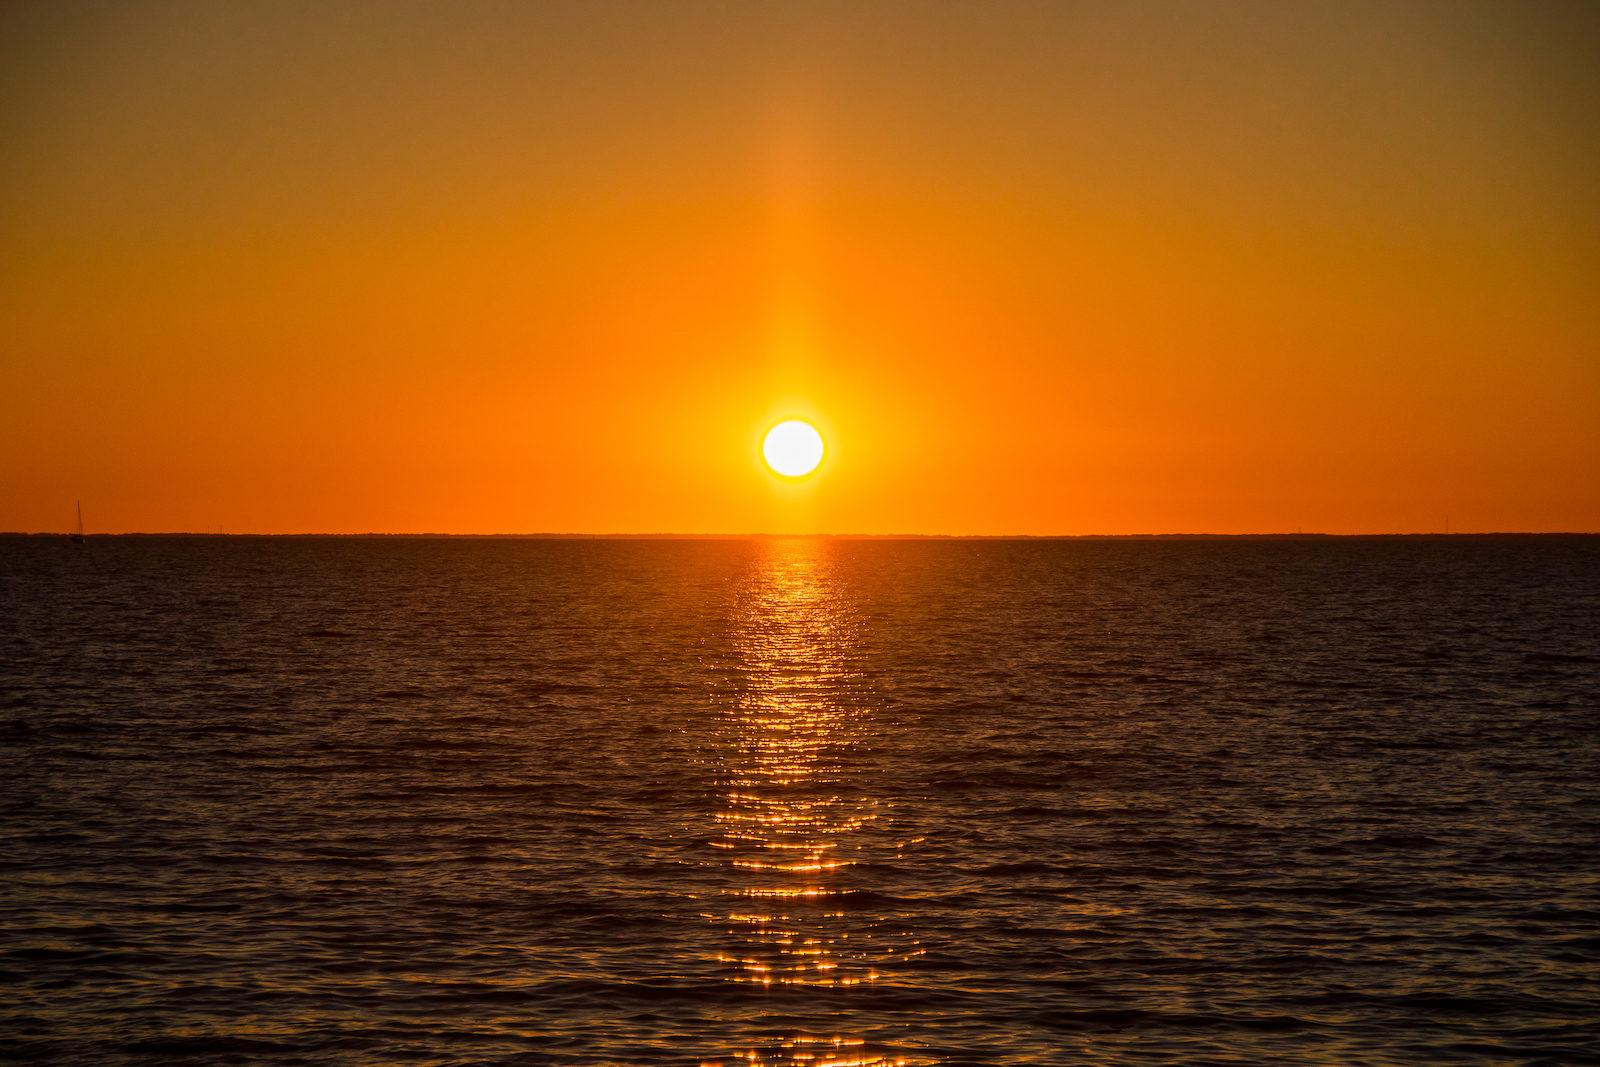 Sunset in Fairhope, AL